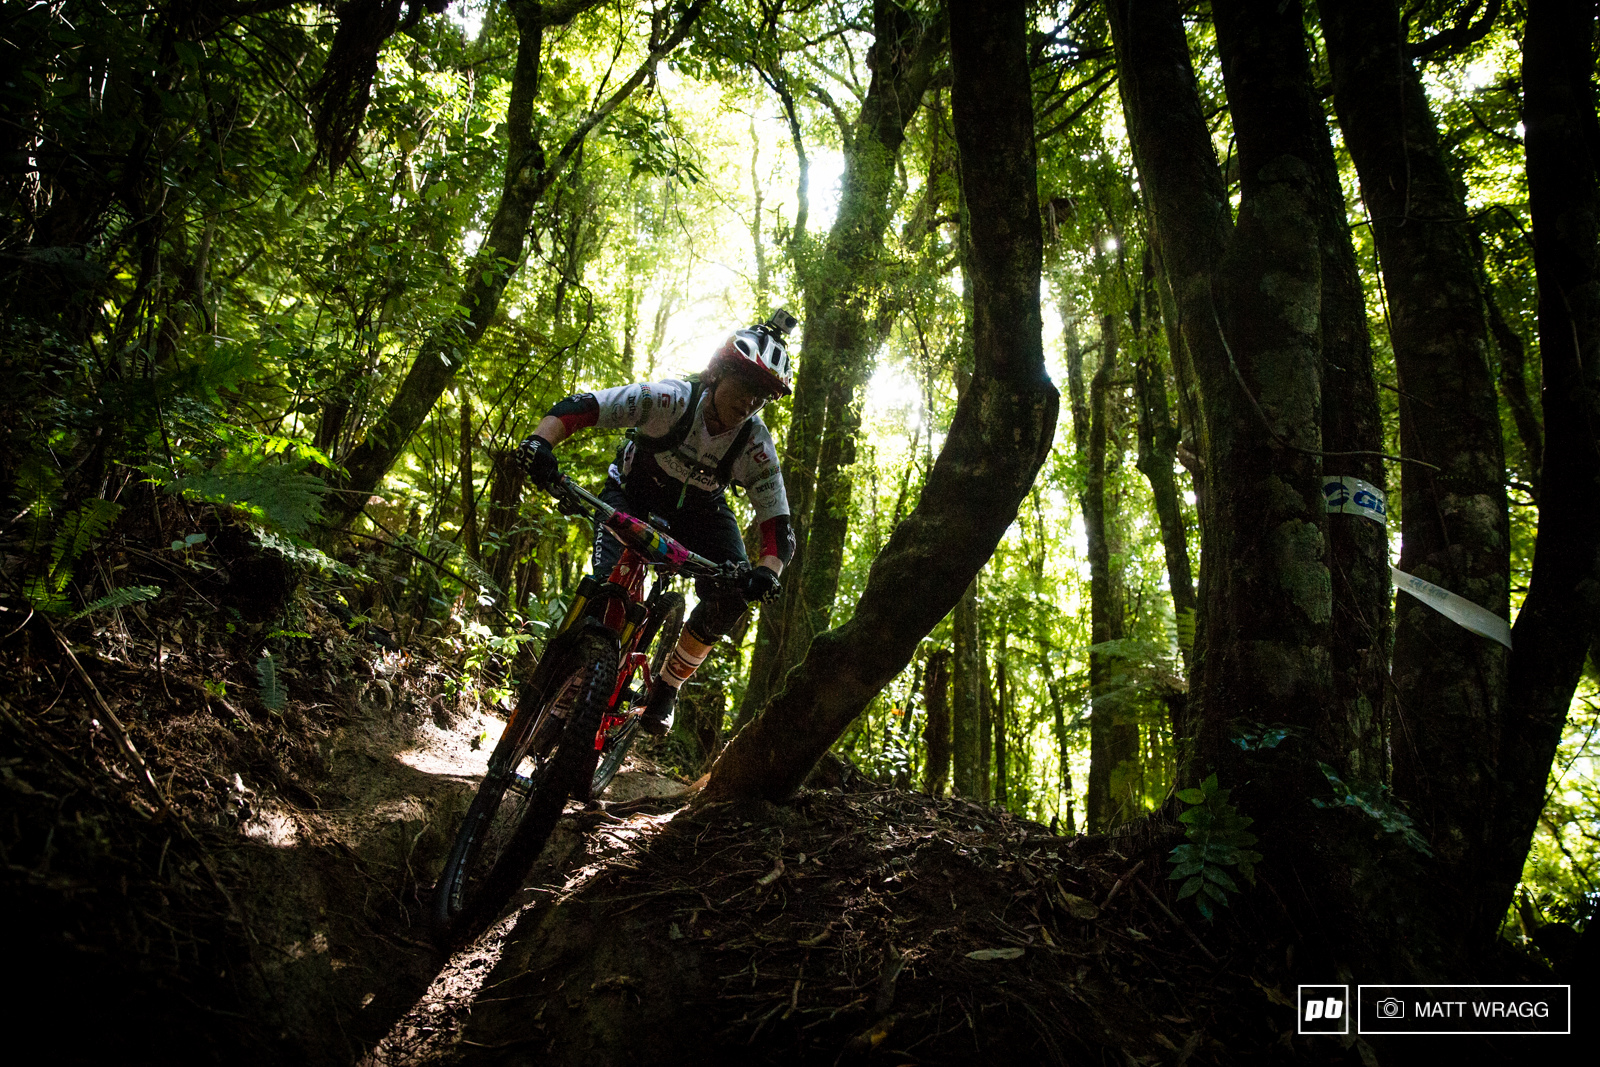 Practice EWS 1 2015 Rotorua New Zealand.